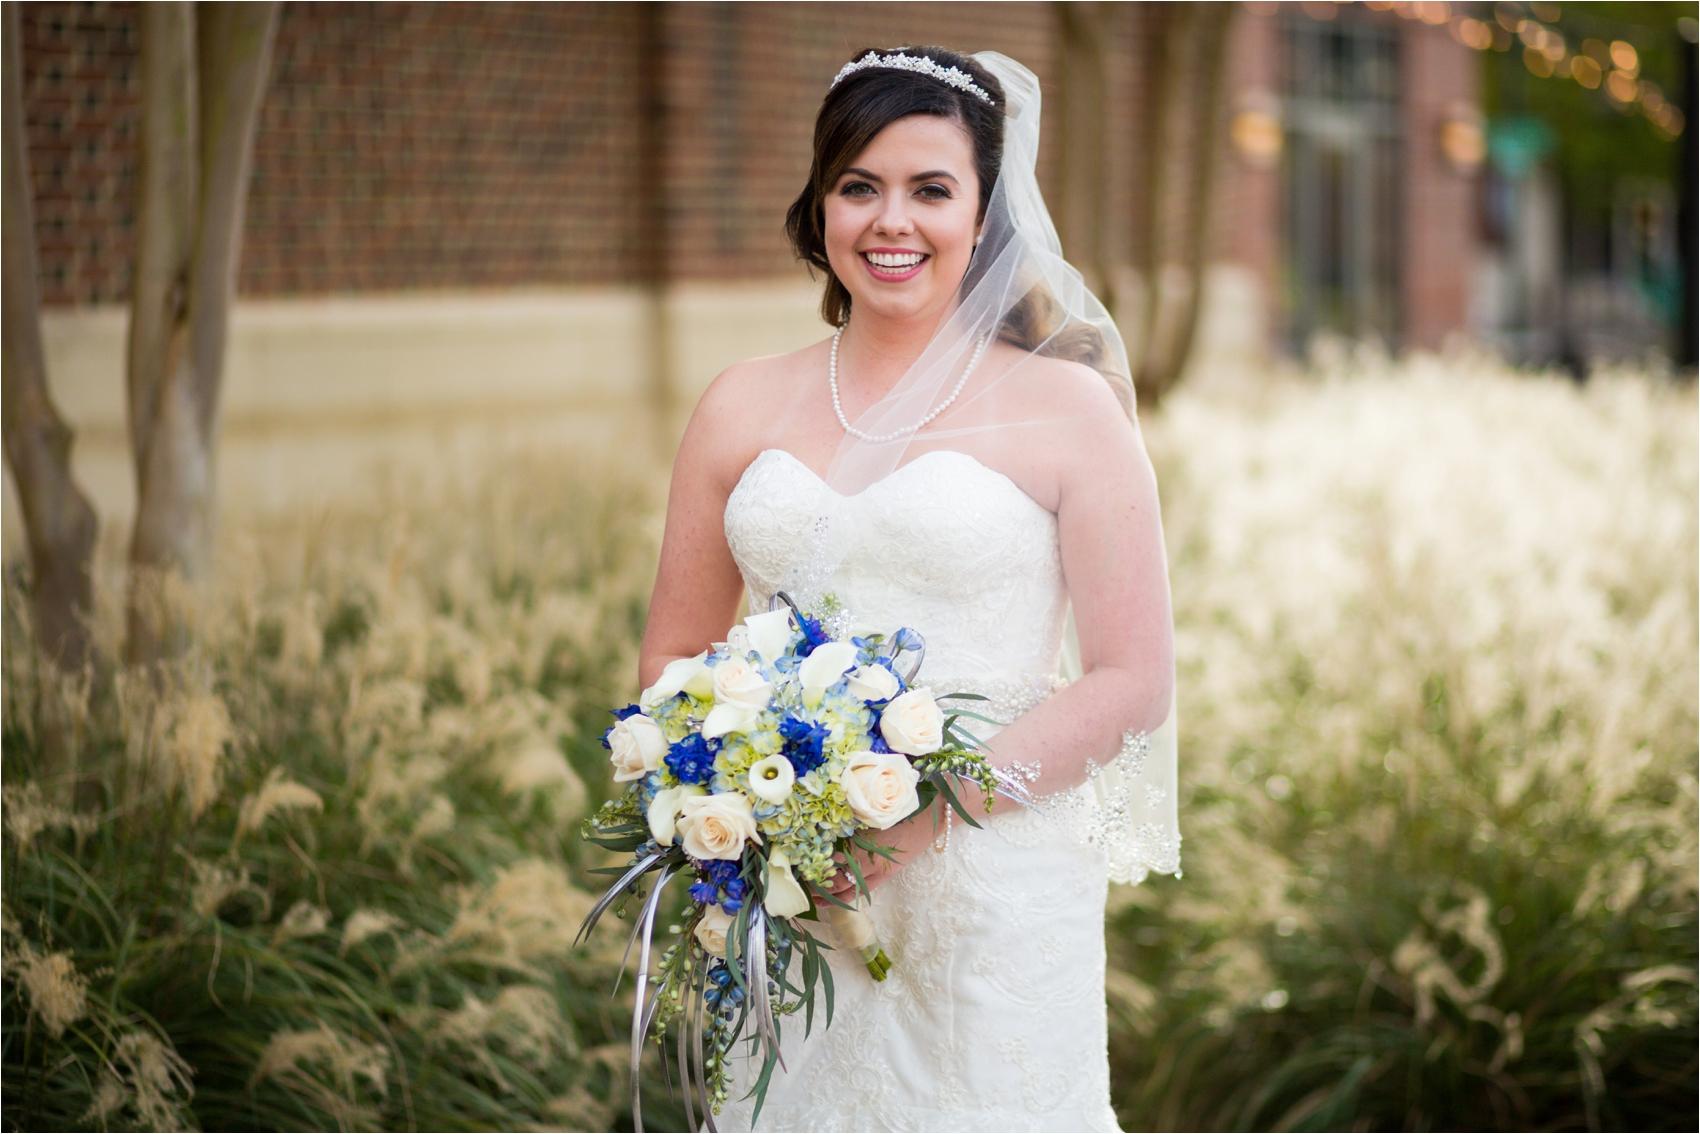 Newport-News-Winter-Wonderland-Wedding_0135.jpg